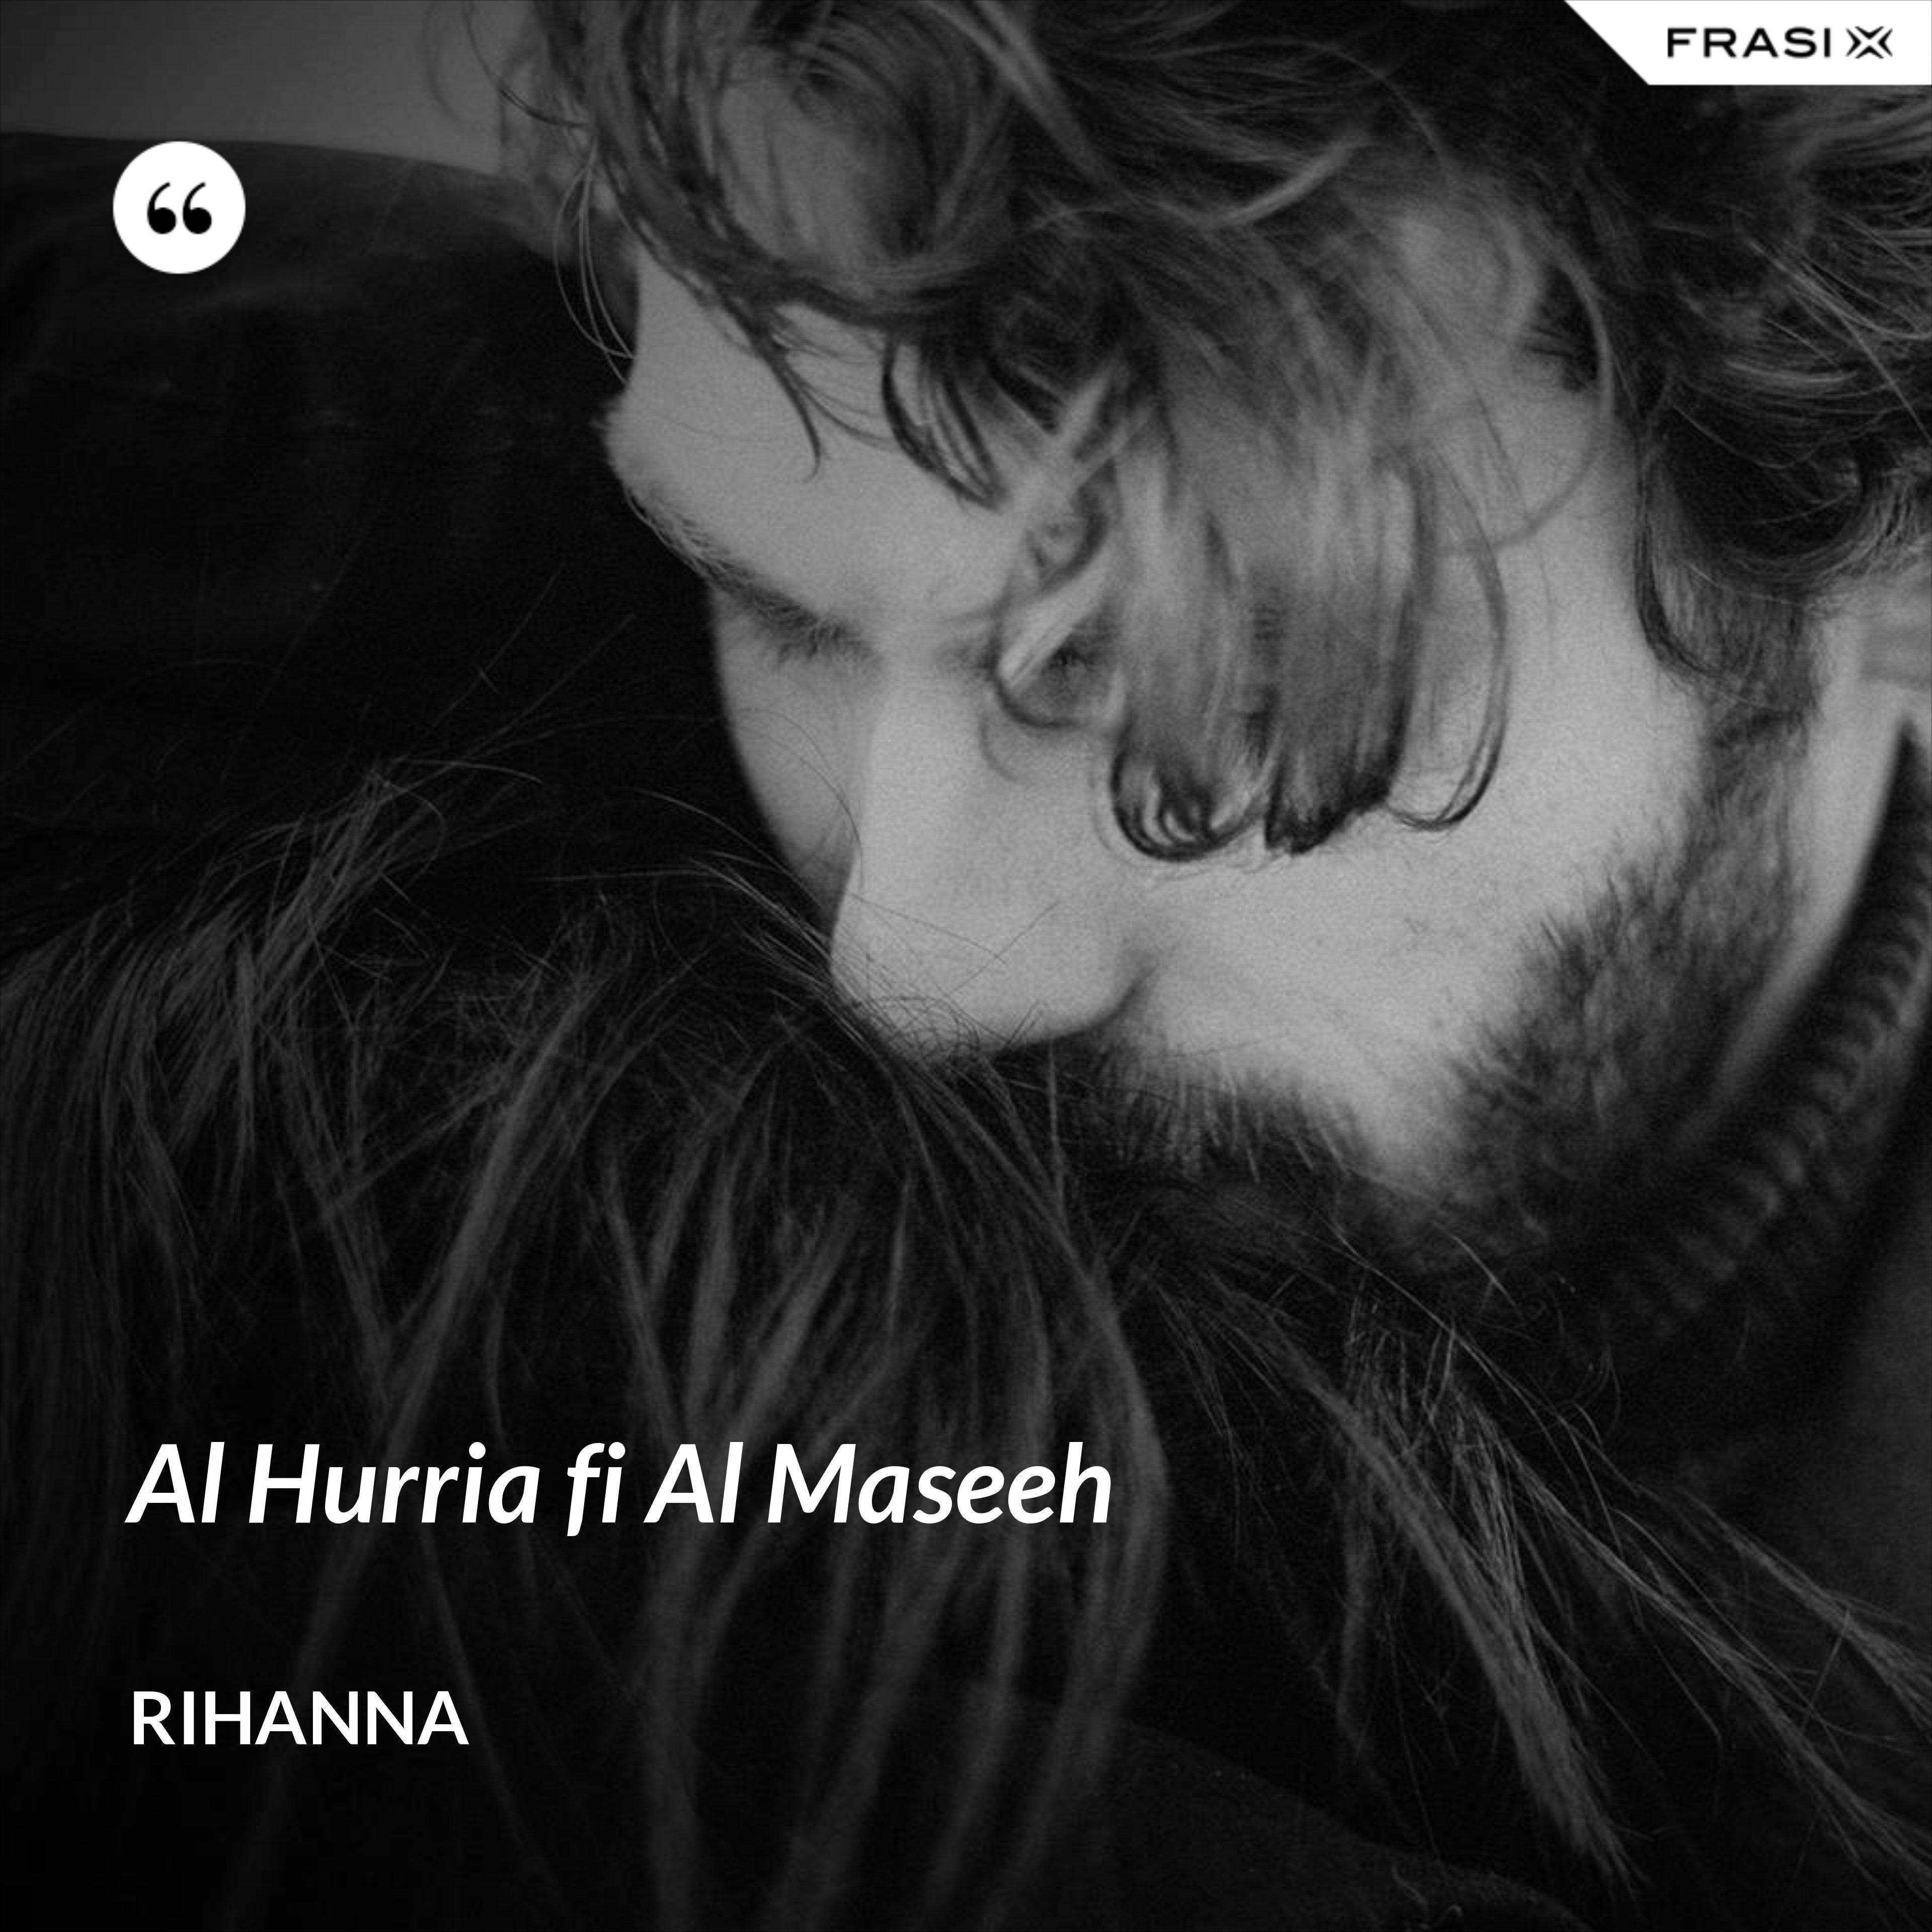 Al Hurria fi Al Maseeh - Rihanna